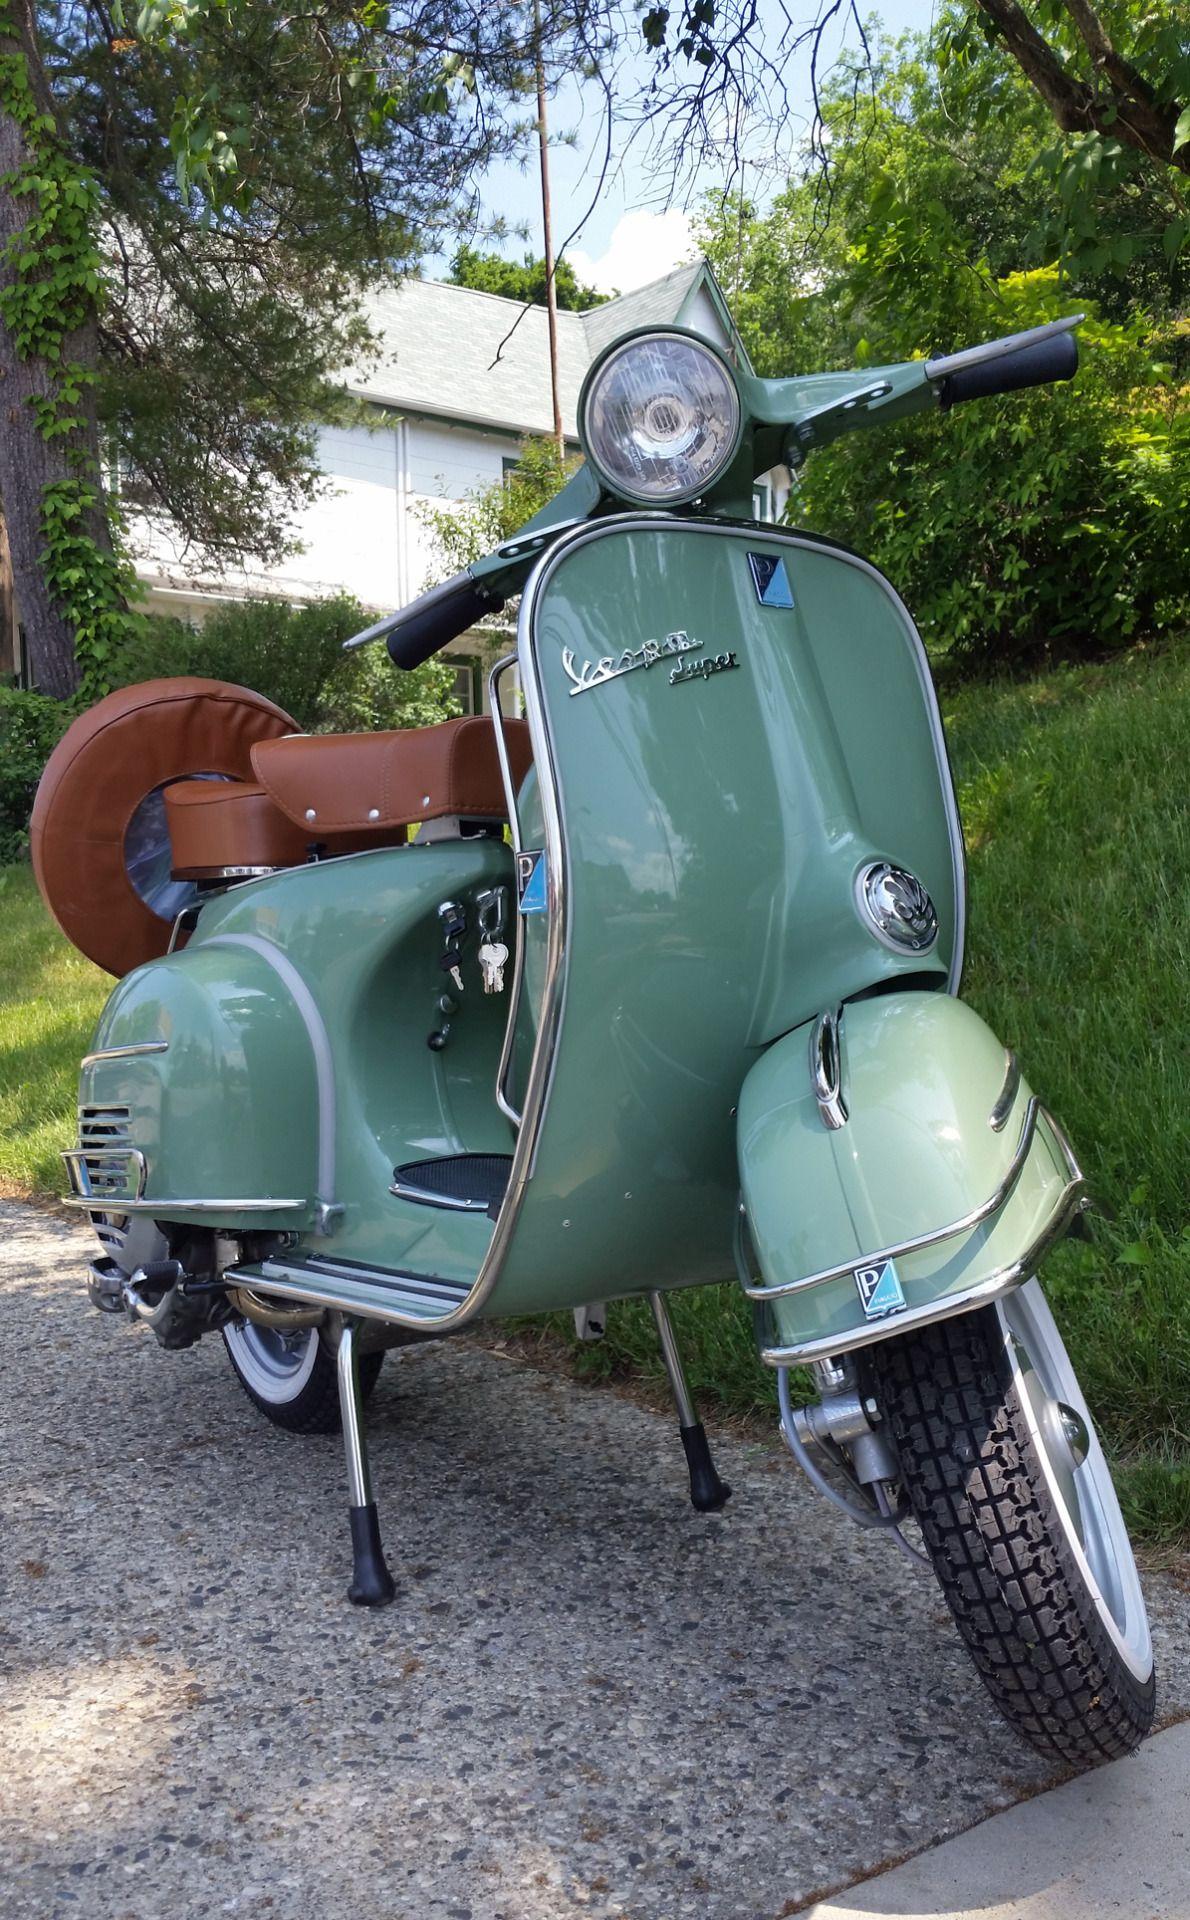 Vintage Vespa Scooters For Sale … (met